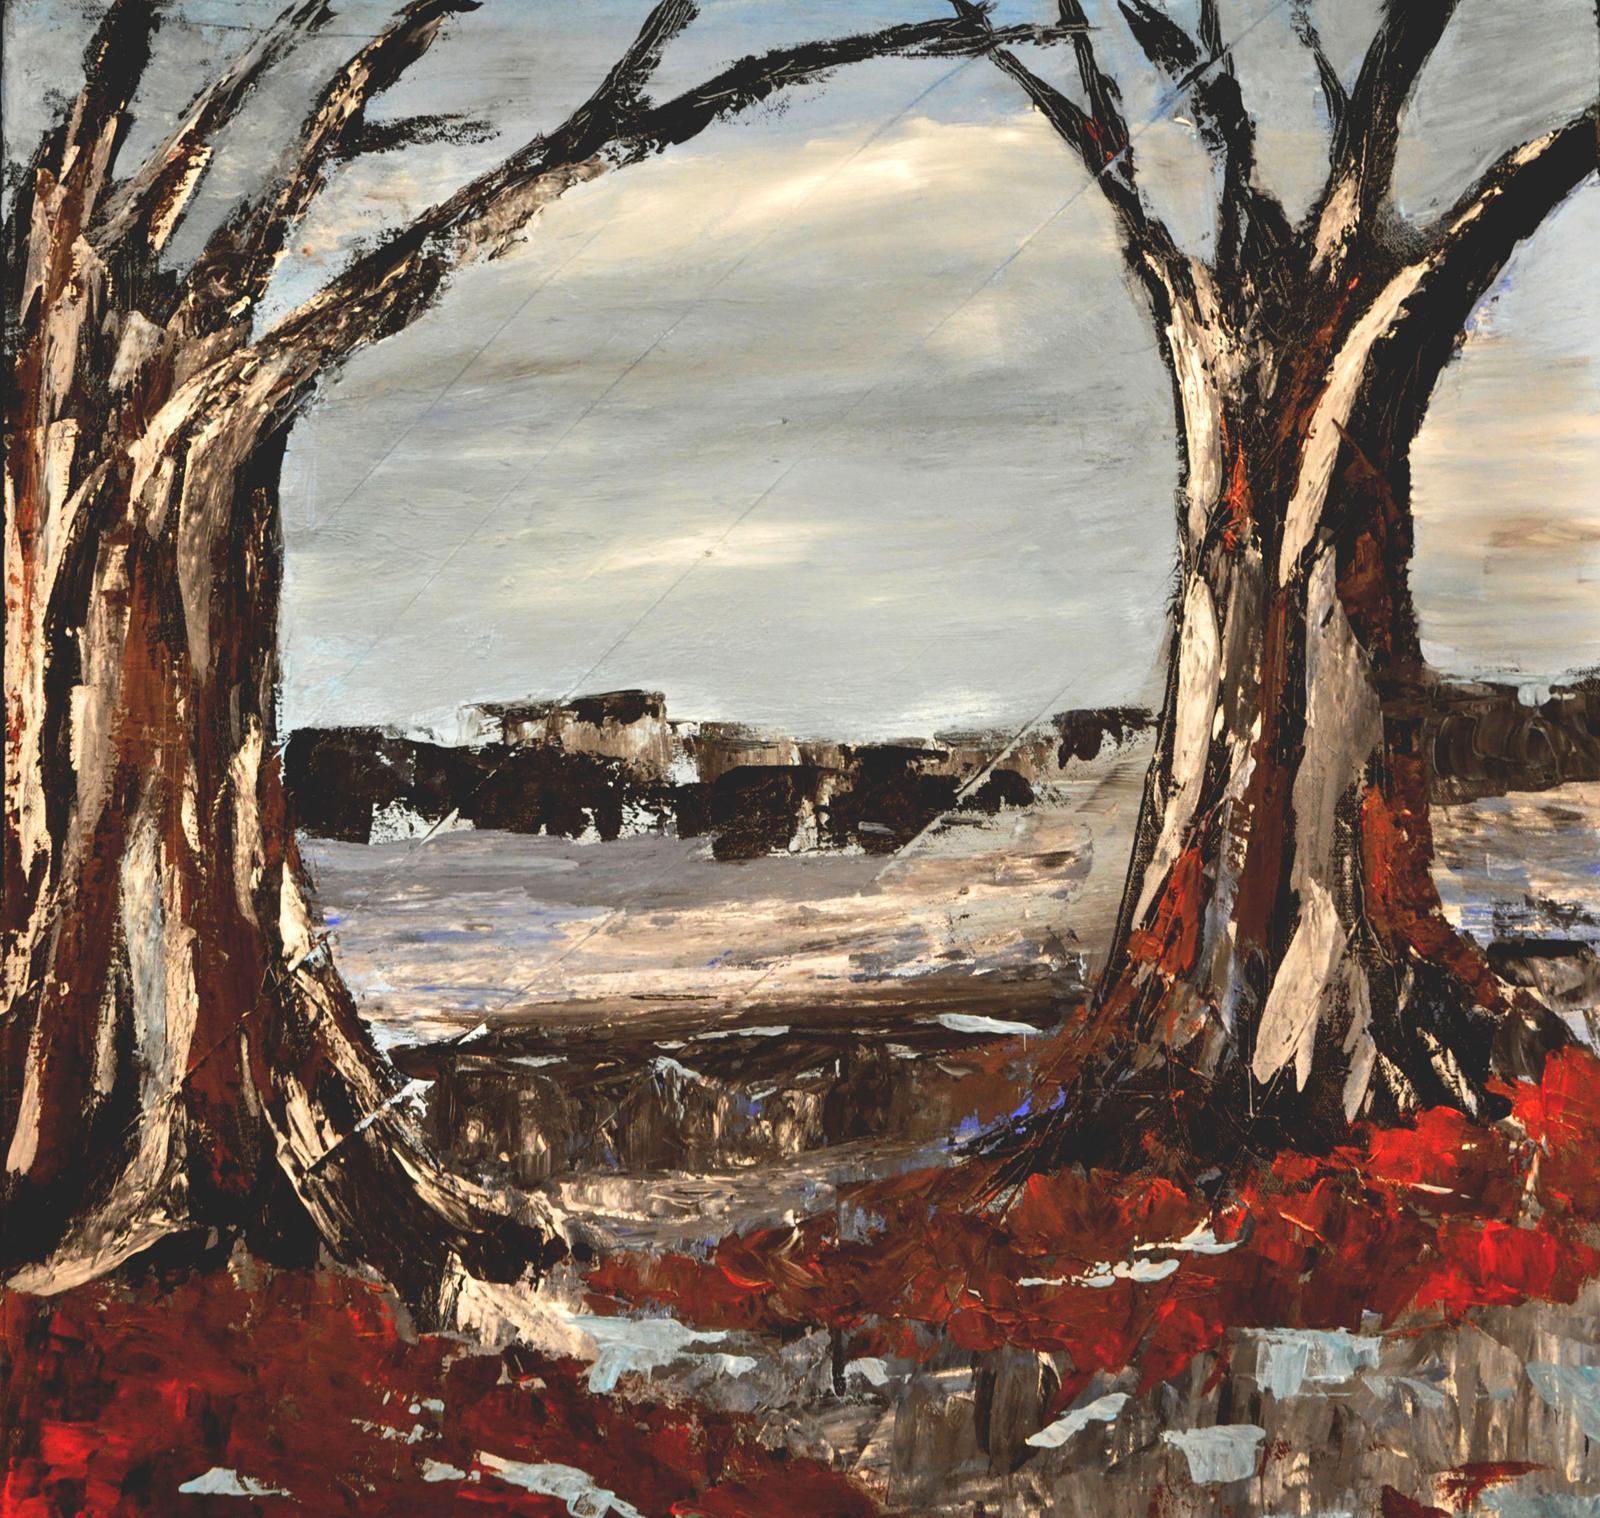 Edge of Winter by Carol Baker (MG: April 2014)